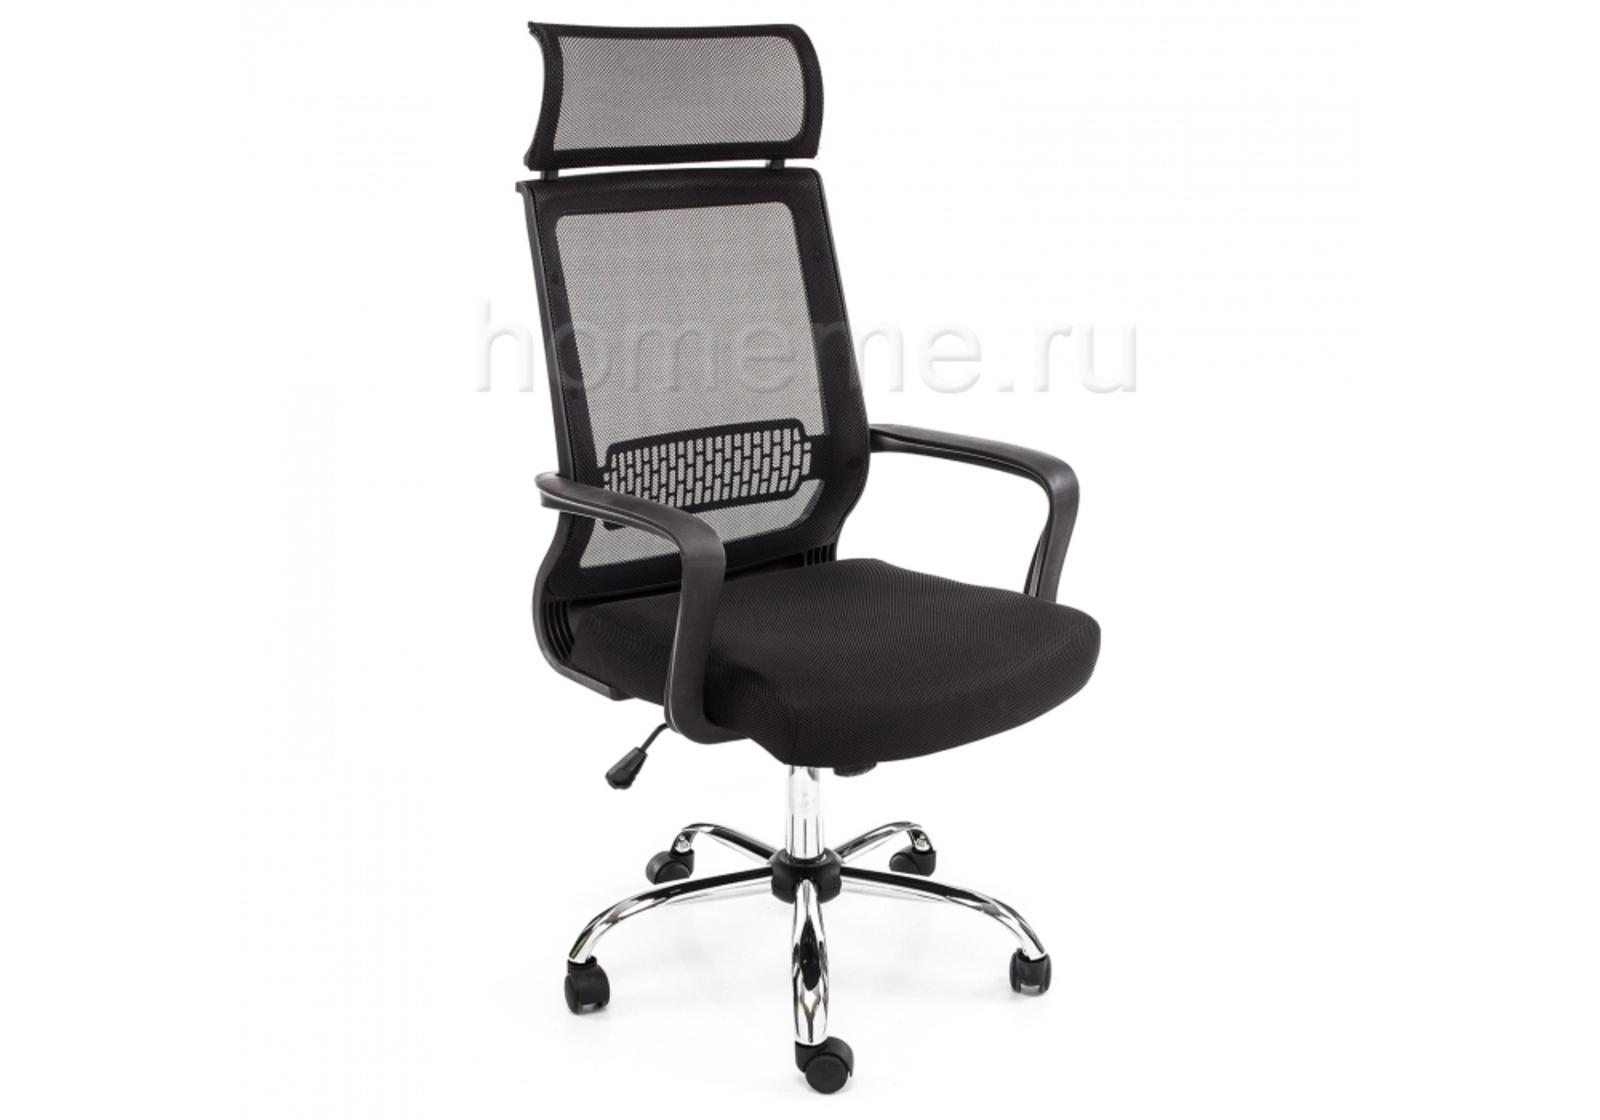 Кресло для офиса HomeMe Lion черное 1654 от Homeme.ru